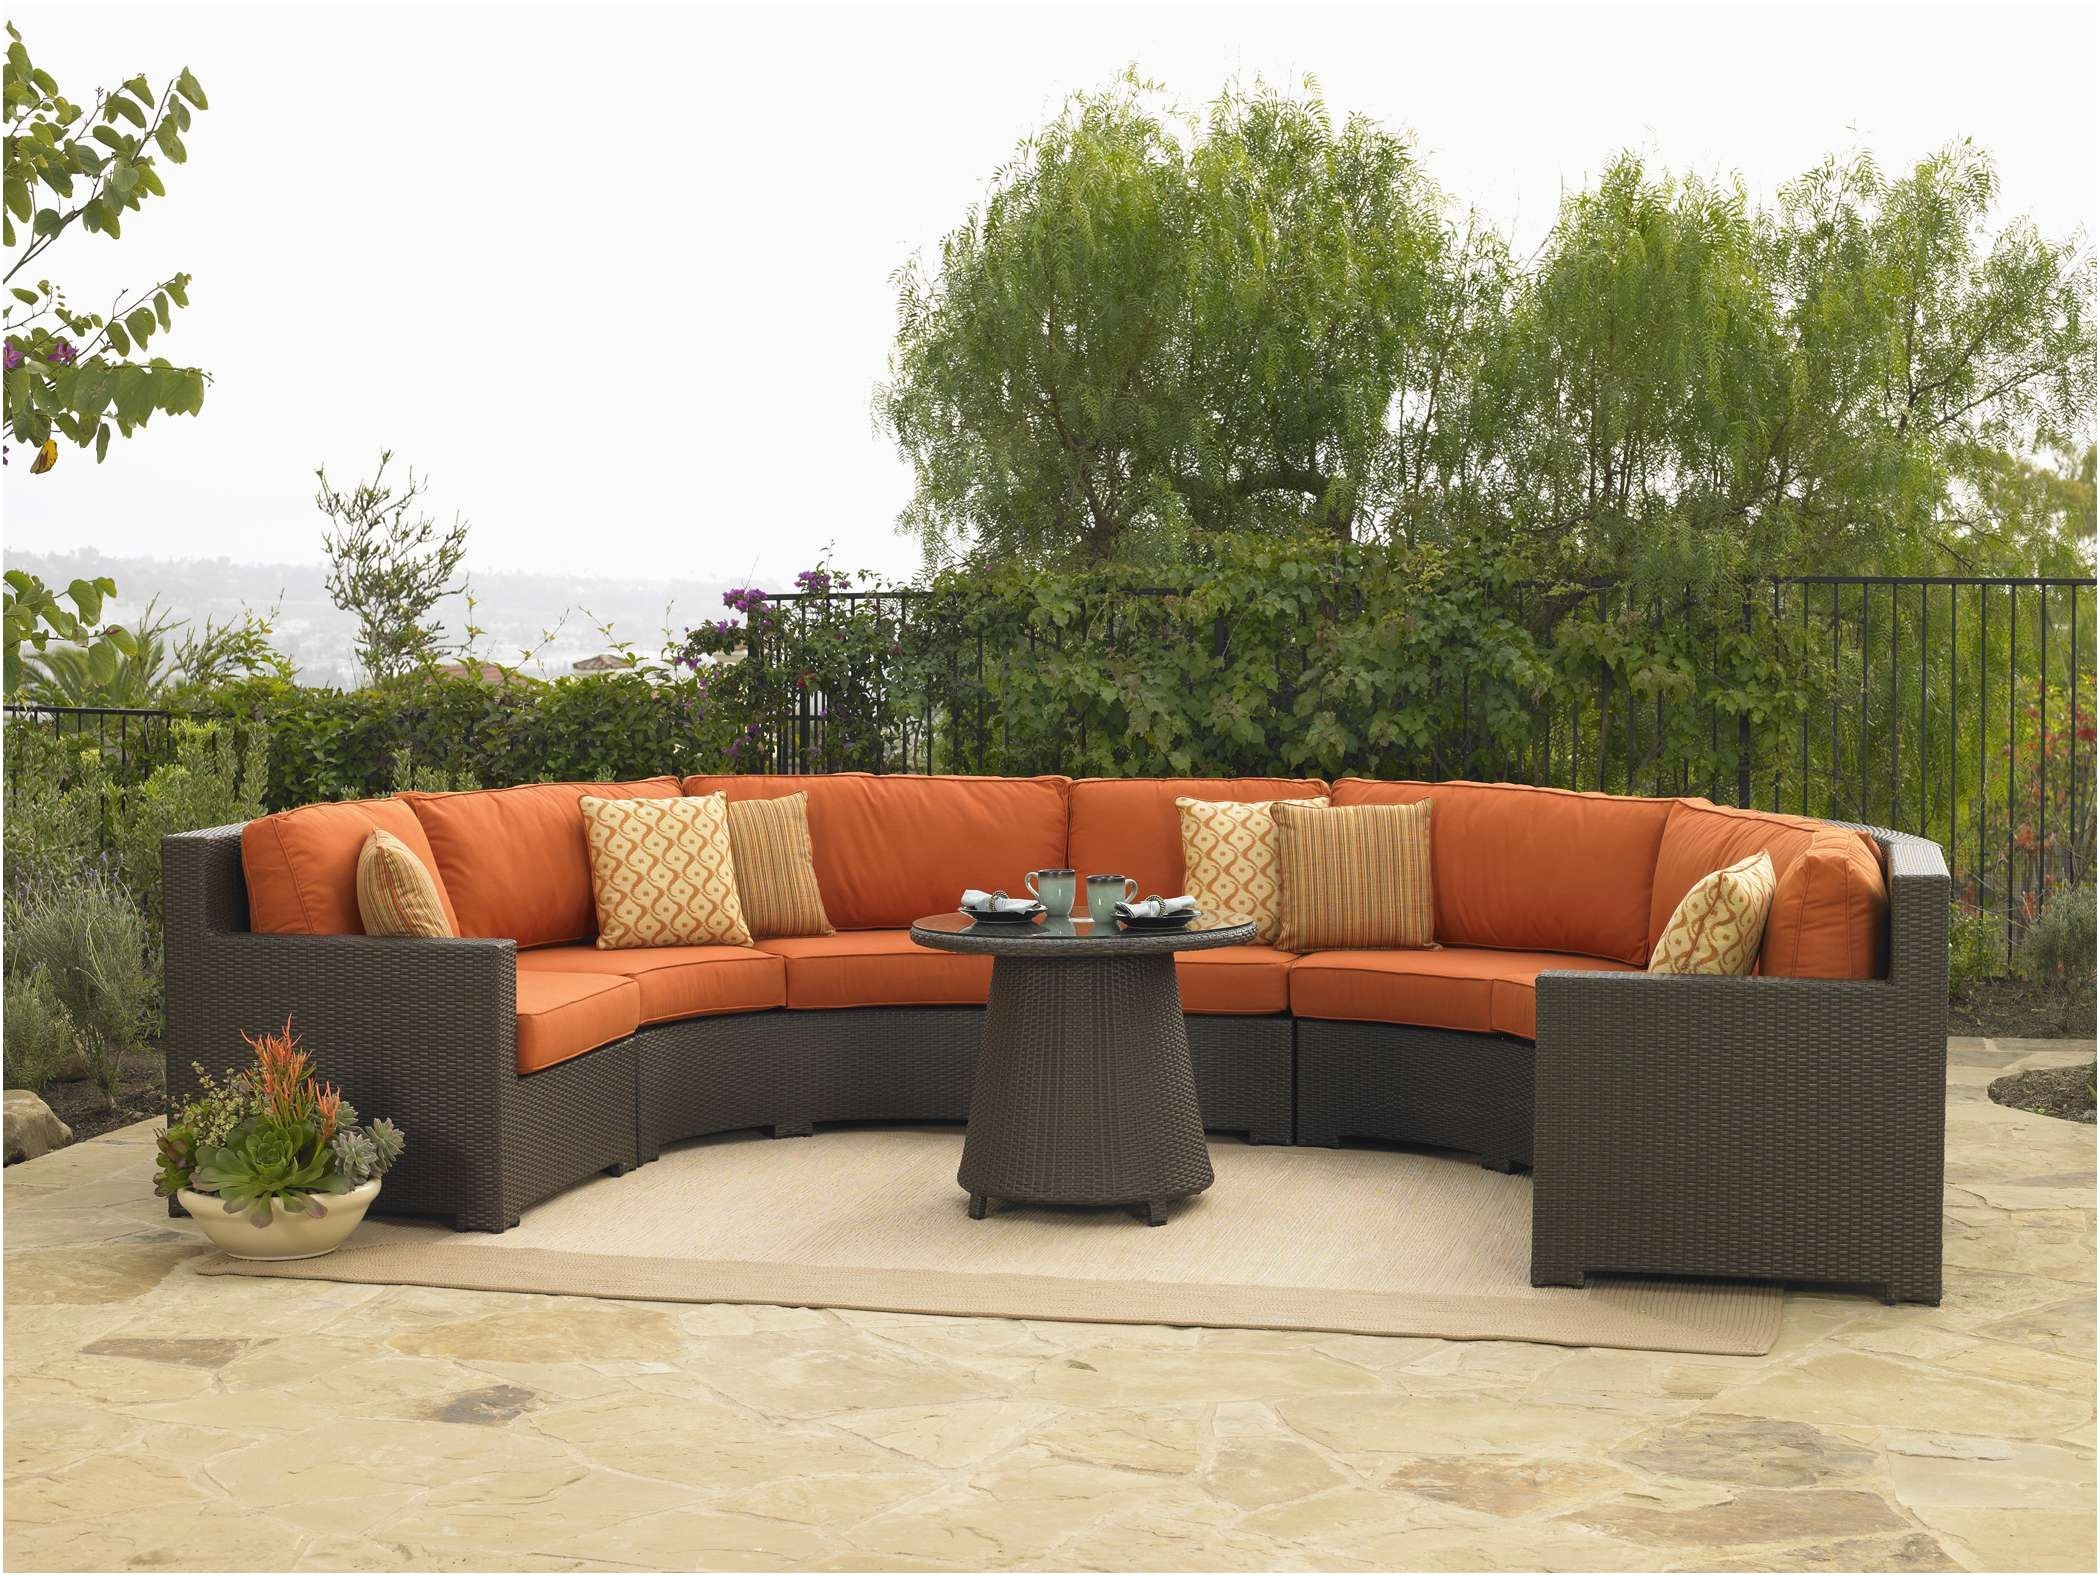 nordstrom home furniture chair home depot bench terrific home depot deck furniture scheme